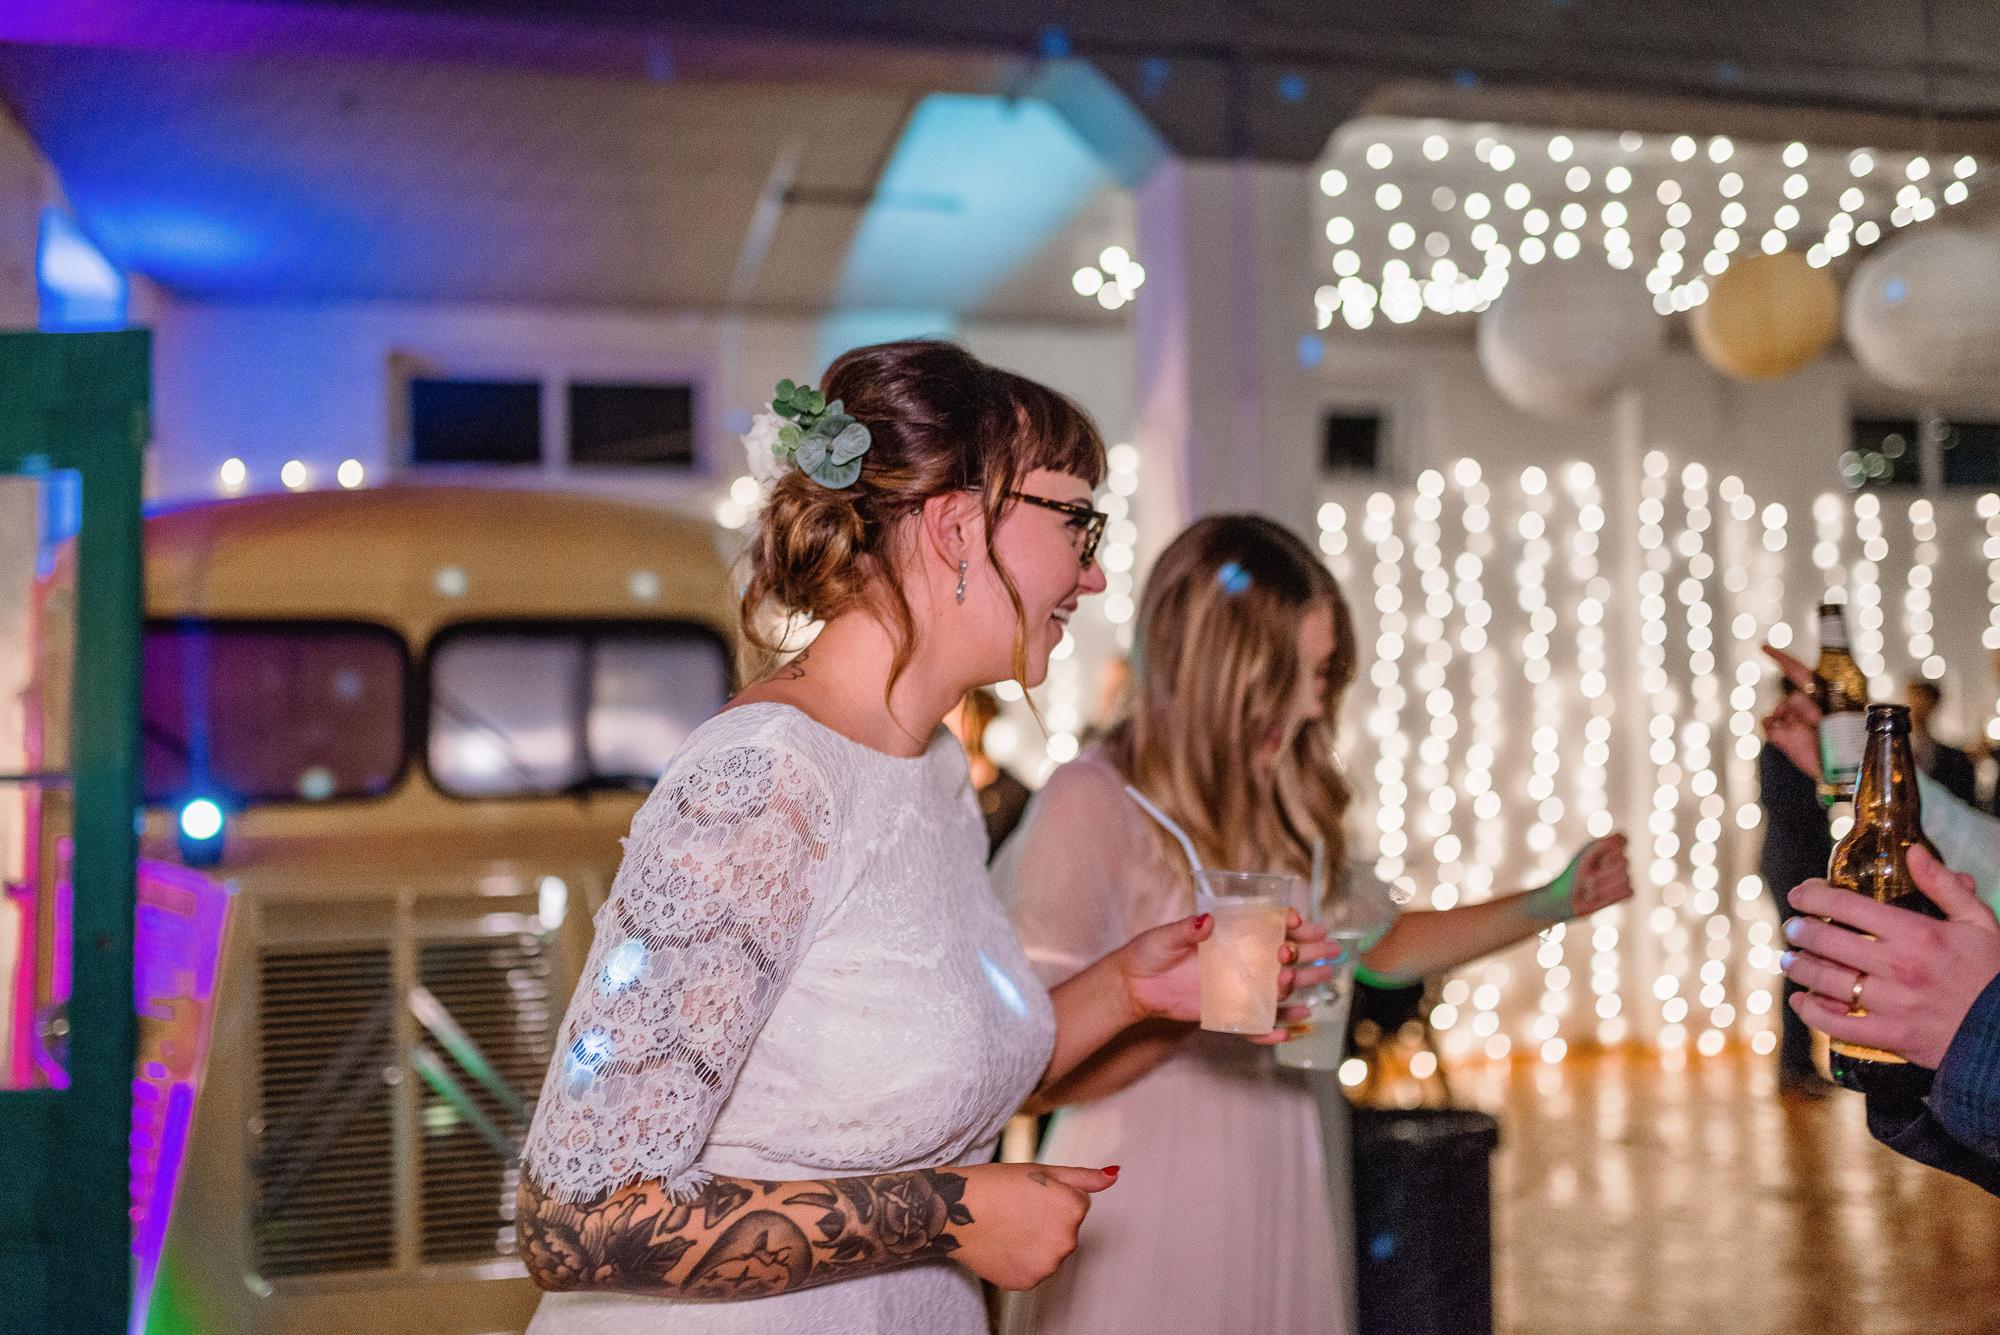 Harriet-Dahlia-Bespoke-Lace-Silk-Bohemian-Wedding-Dress-Sleeves-Tattooed-Bride-Alternative-Wedding-Sheffield-48.jpg